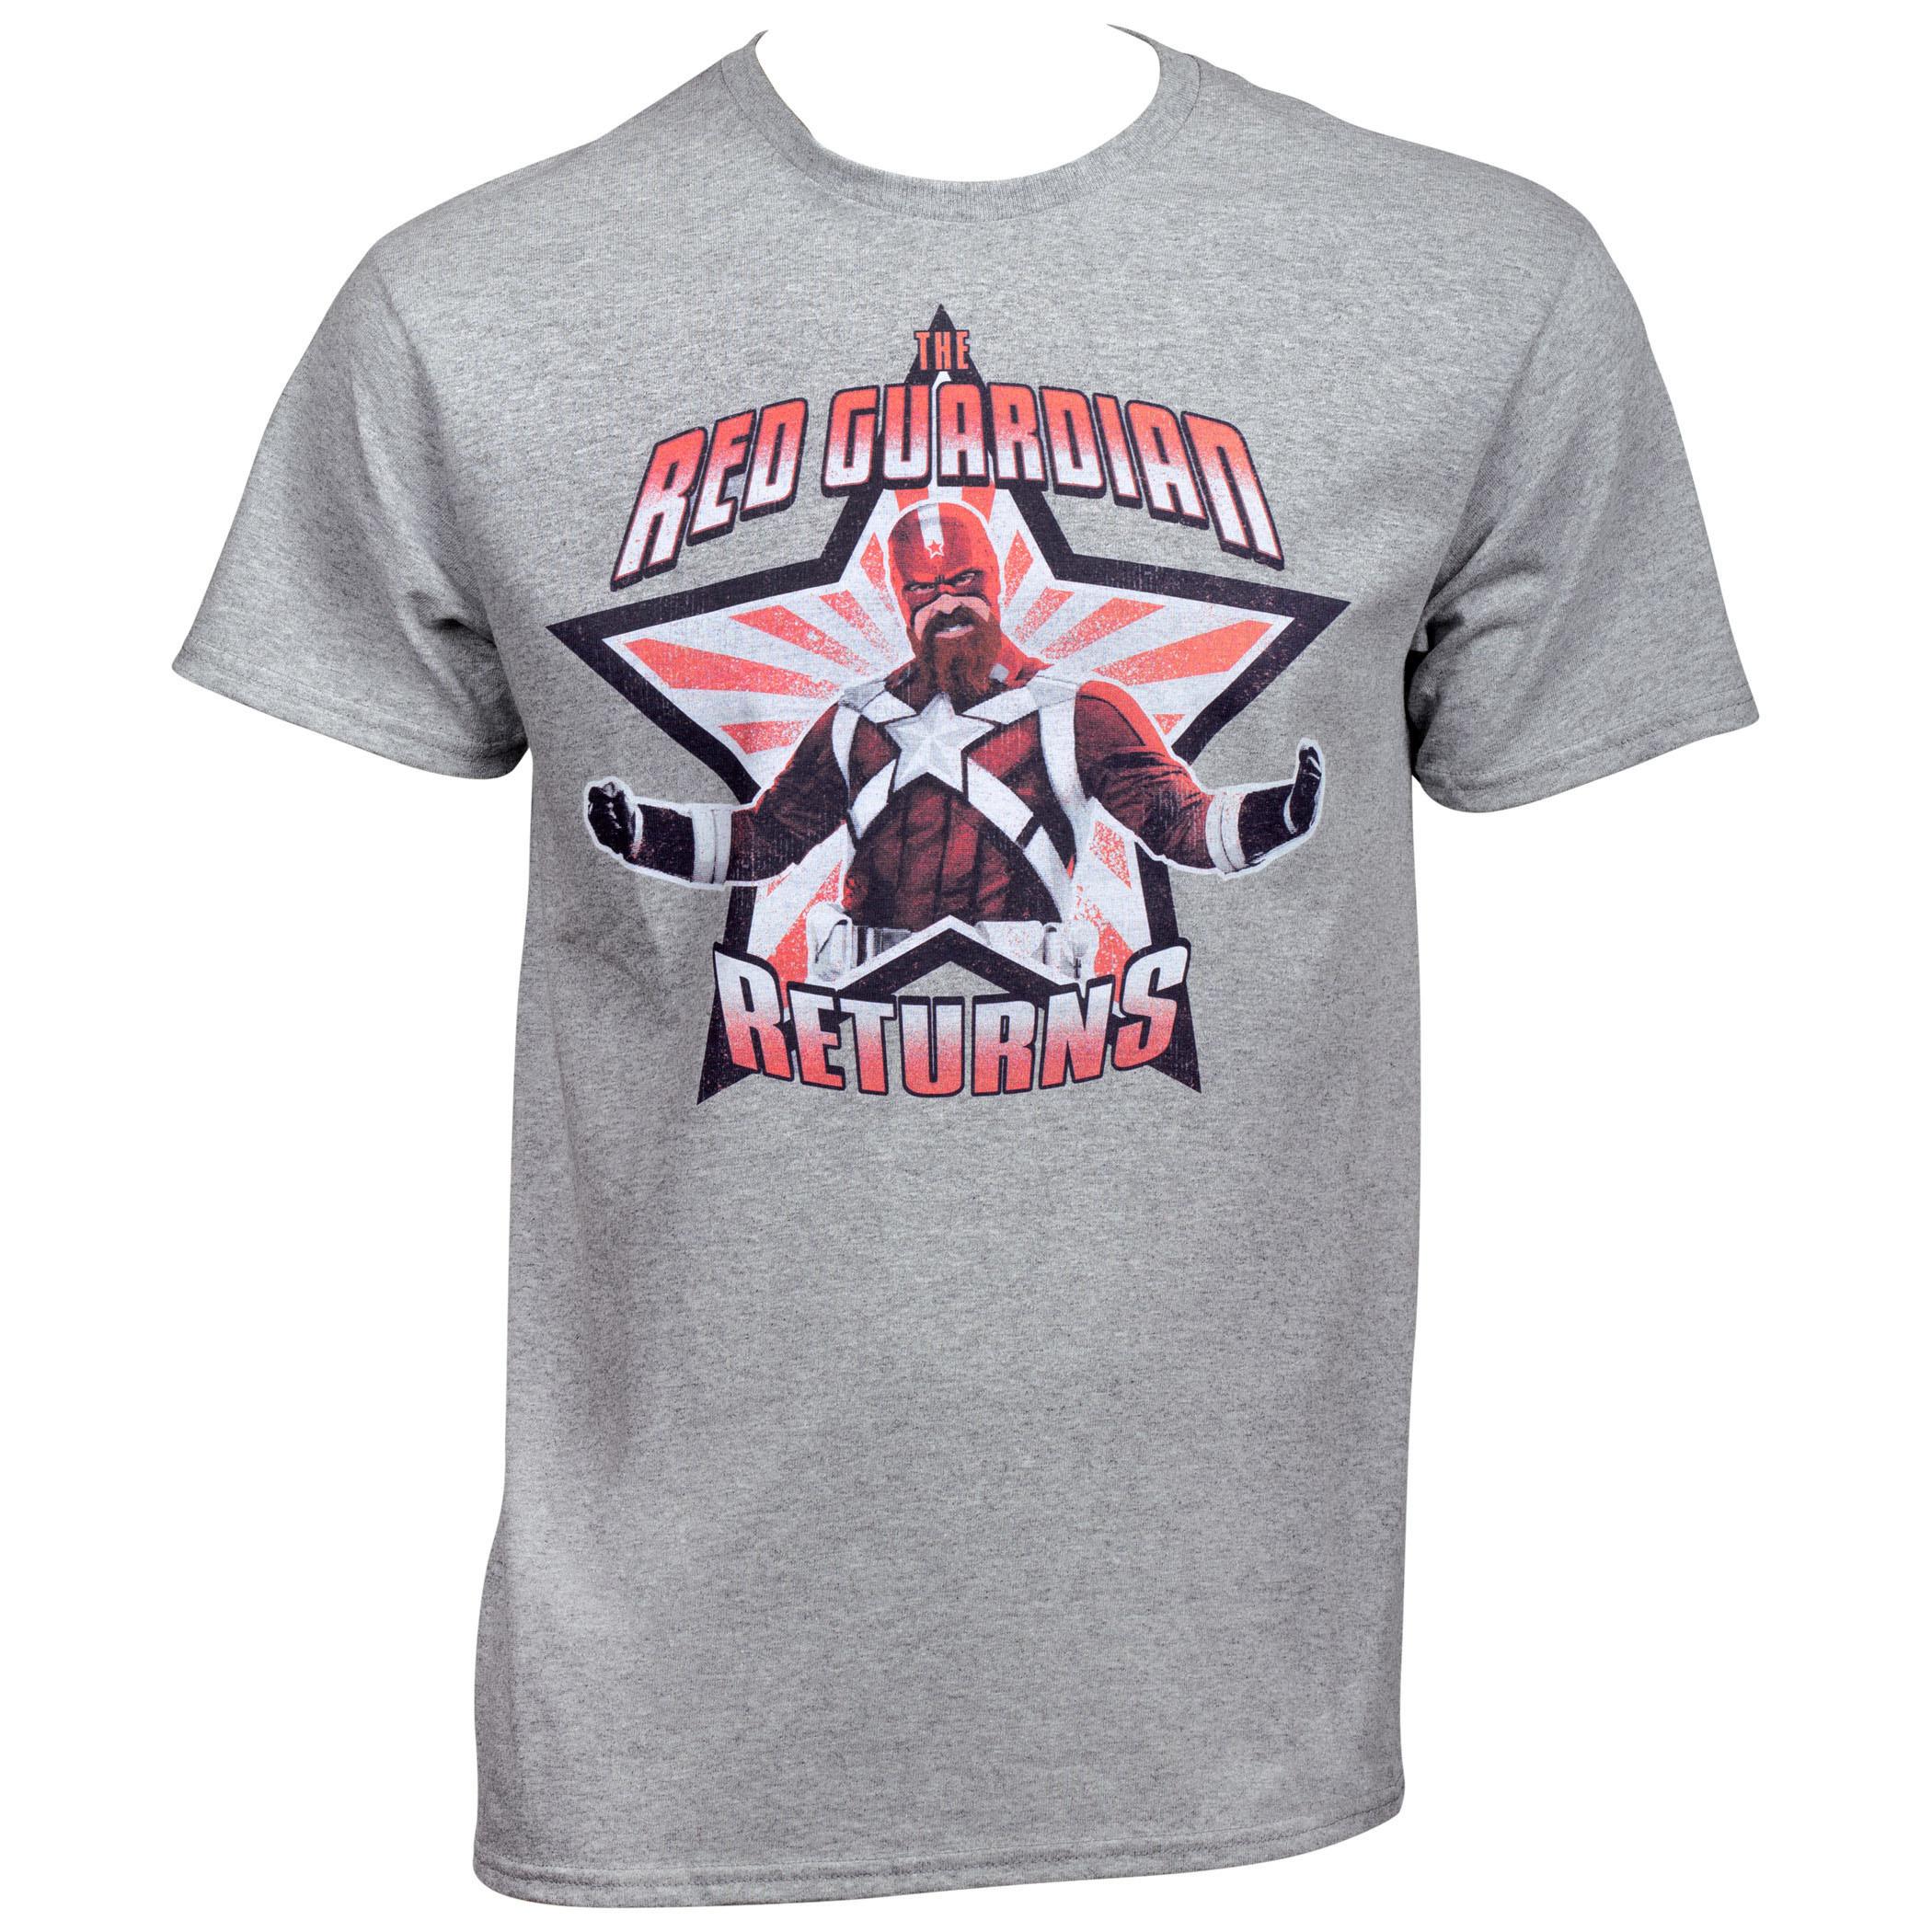 The Red Guardian Returns Black Widow Movie T-Shirt